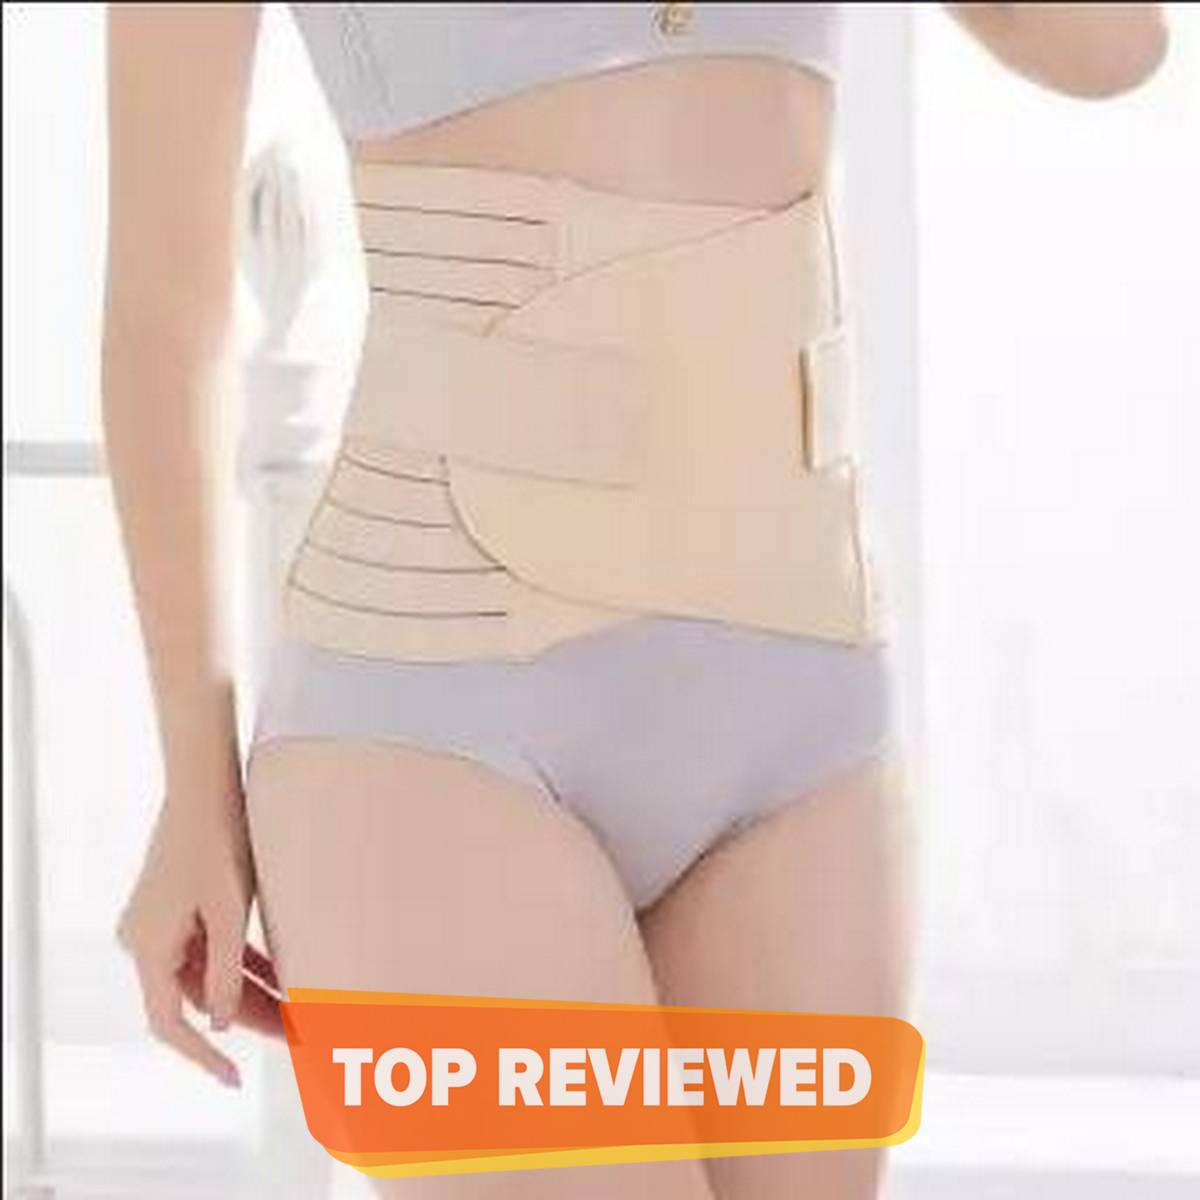 3 in 1 Postpartum Recovery Body Shaper Belt (Slimming Maternity Band Belly Waist Shape Wear) Best for under 37 waist size